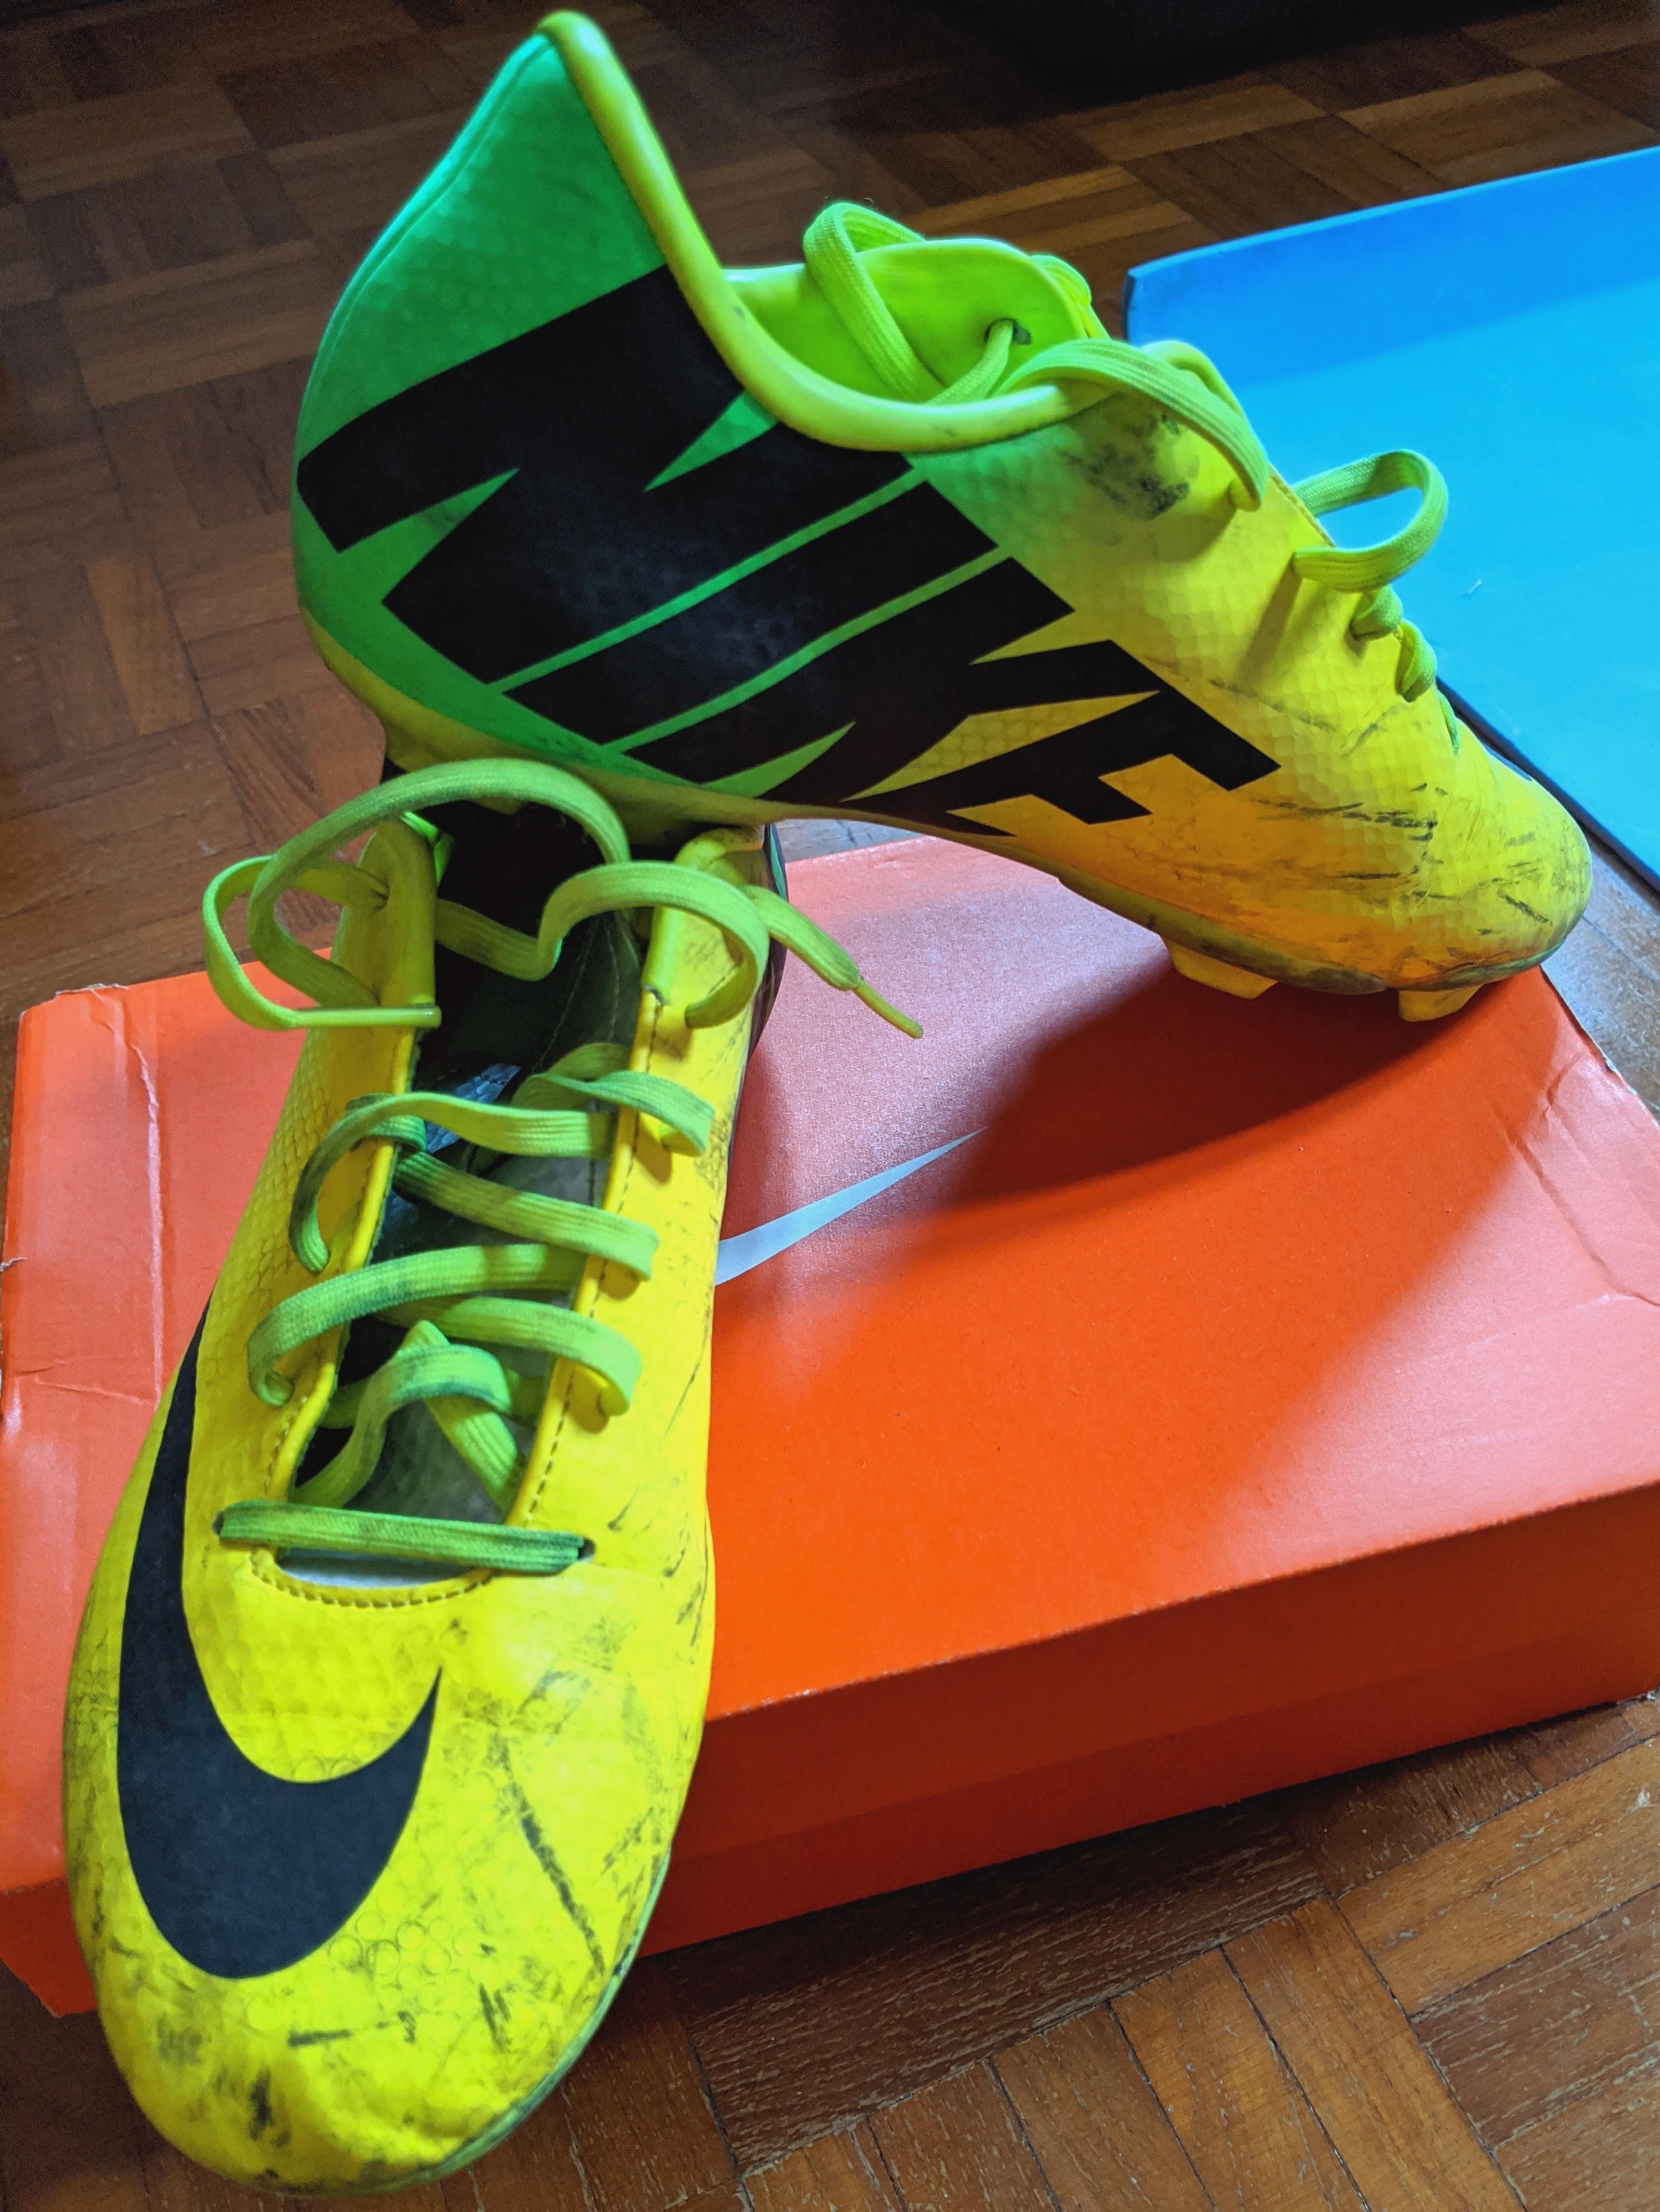 Instrumento tambor Crudo  Nike Jr Mercurial Victory IV FG Soccer Boots, Sports, Sports & Games  Equipment on Carousell